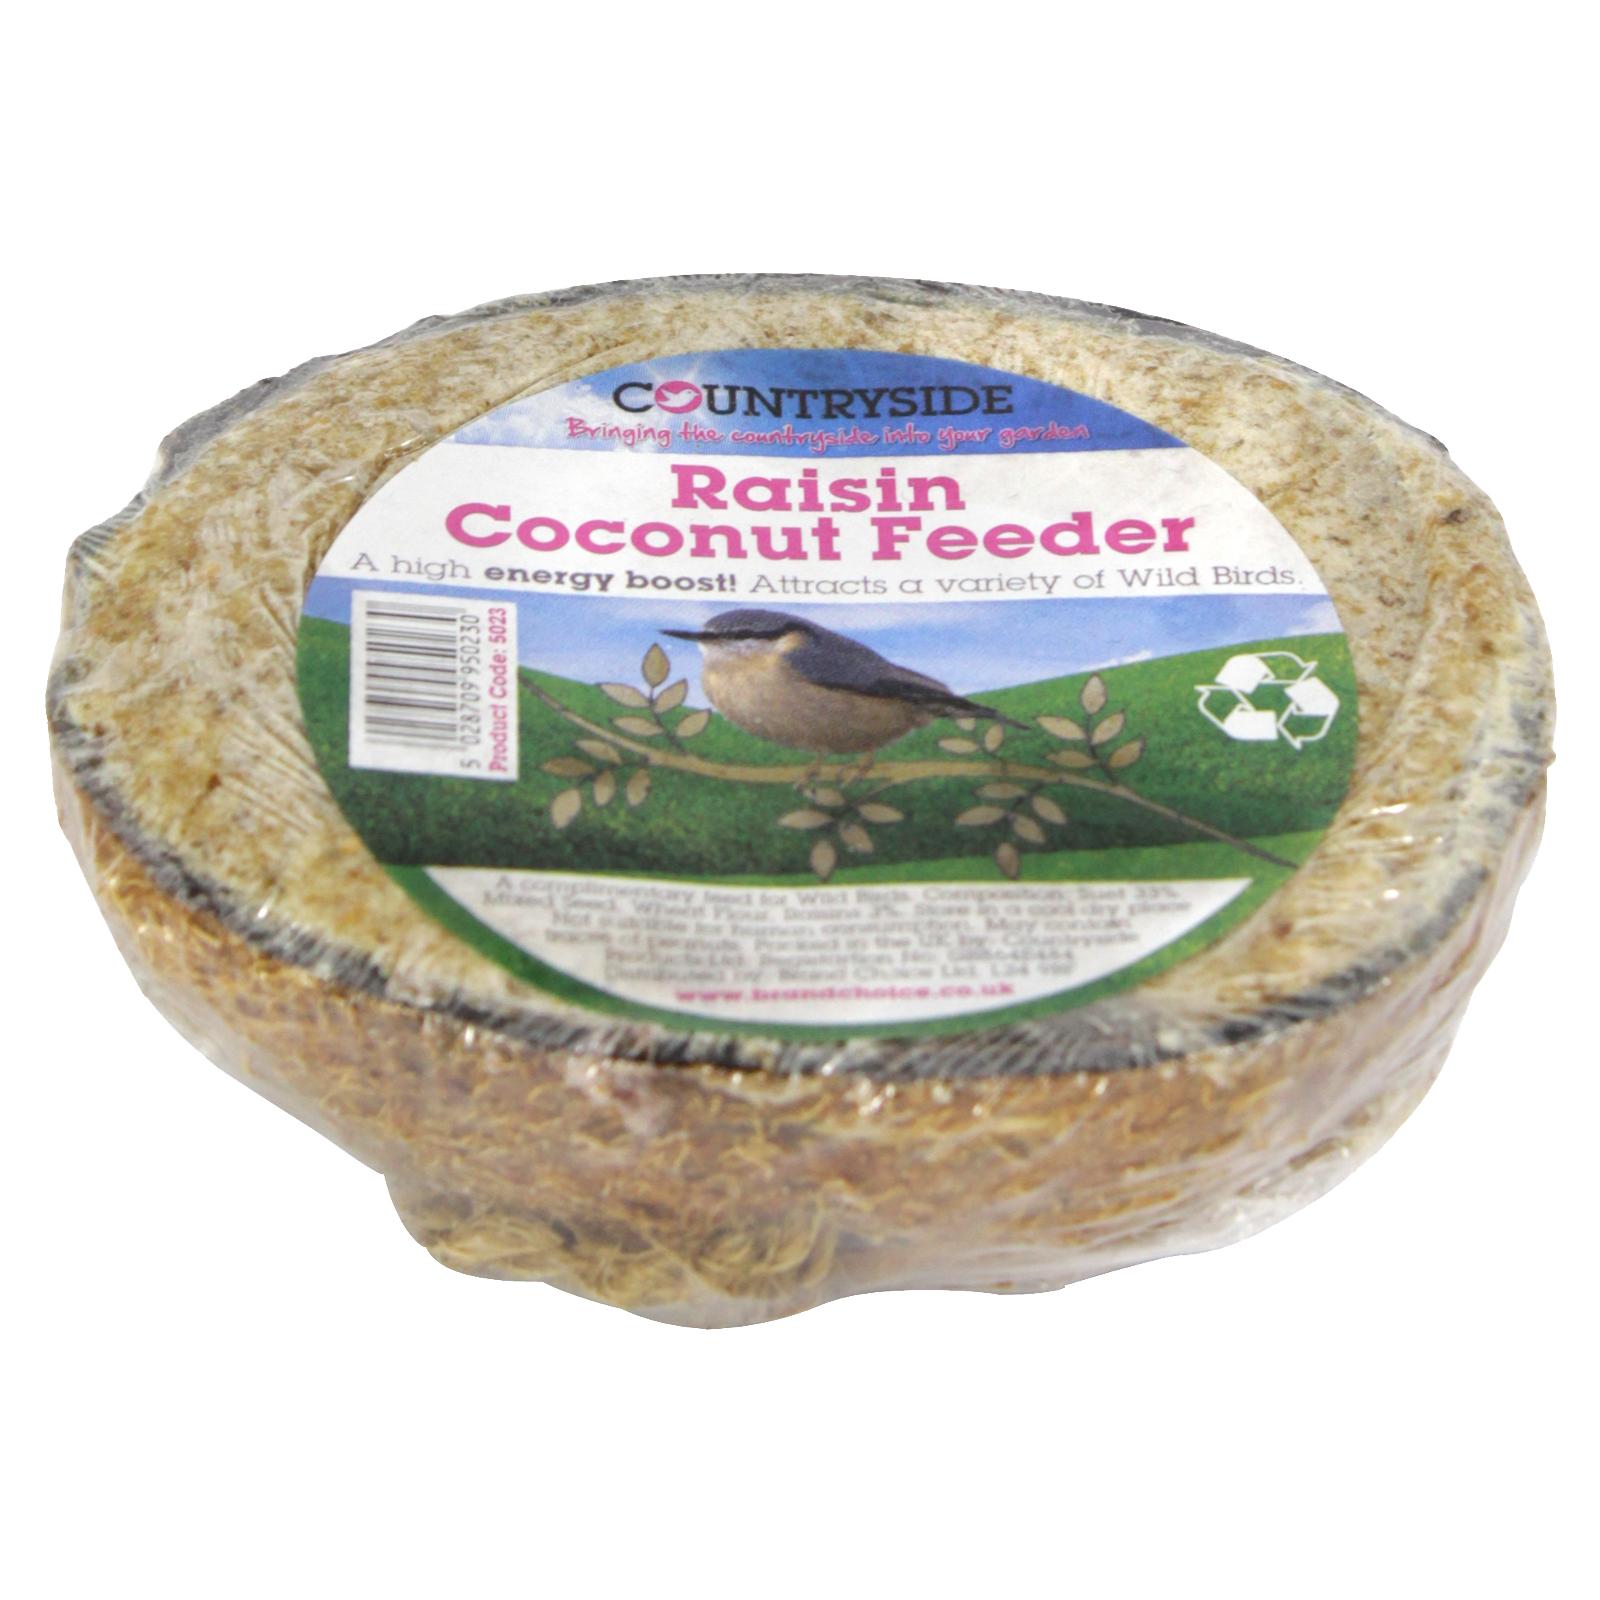 COUNTRYSIDE COCONUT FEEDER+RAISINS